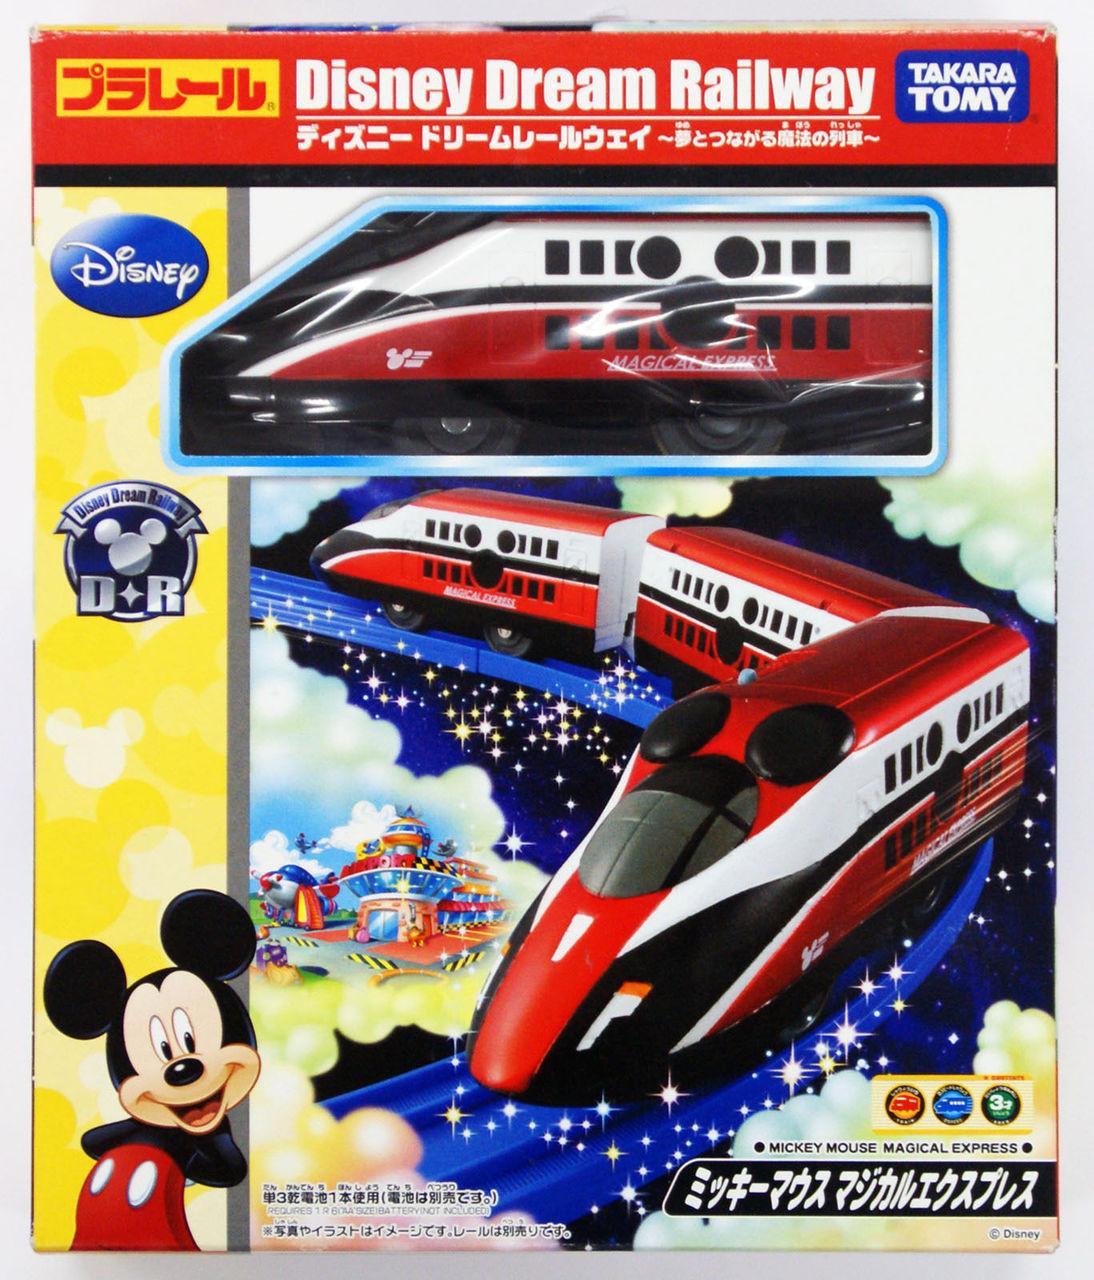 Takara Tomy Pla Rail Plarail Disney Dream Railway Mickey Mouse Magical Express 804079 Plaza Japan